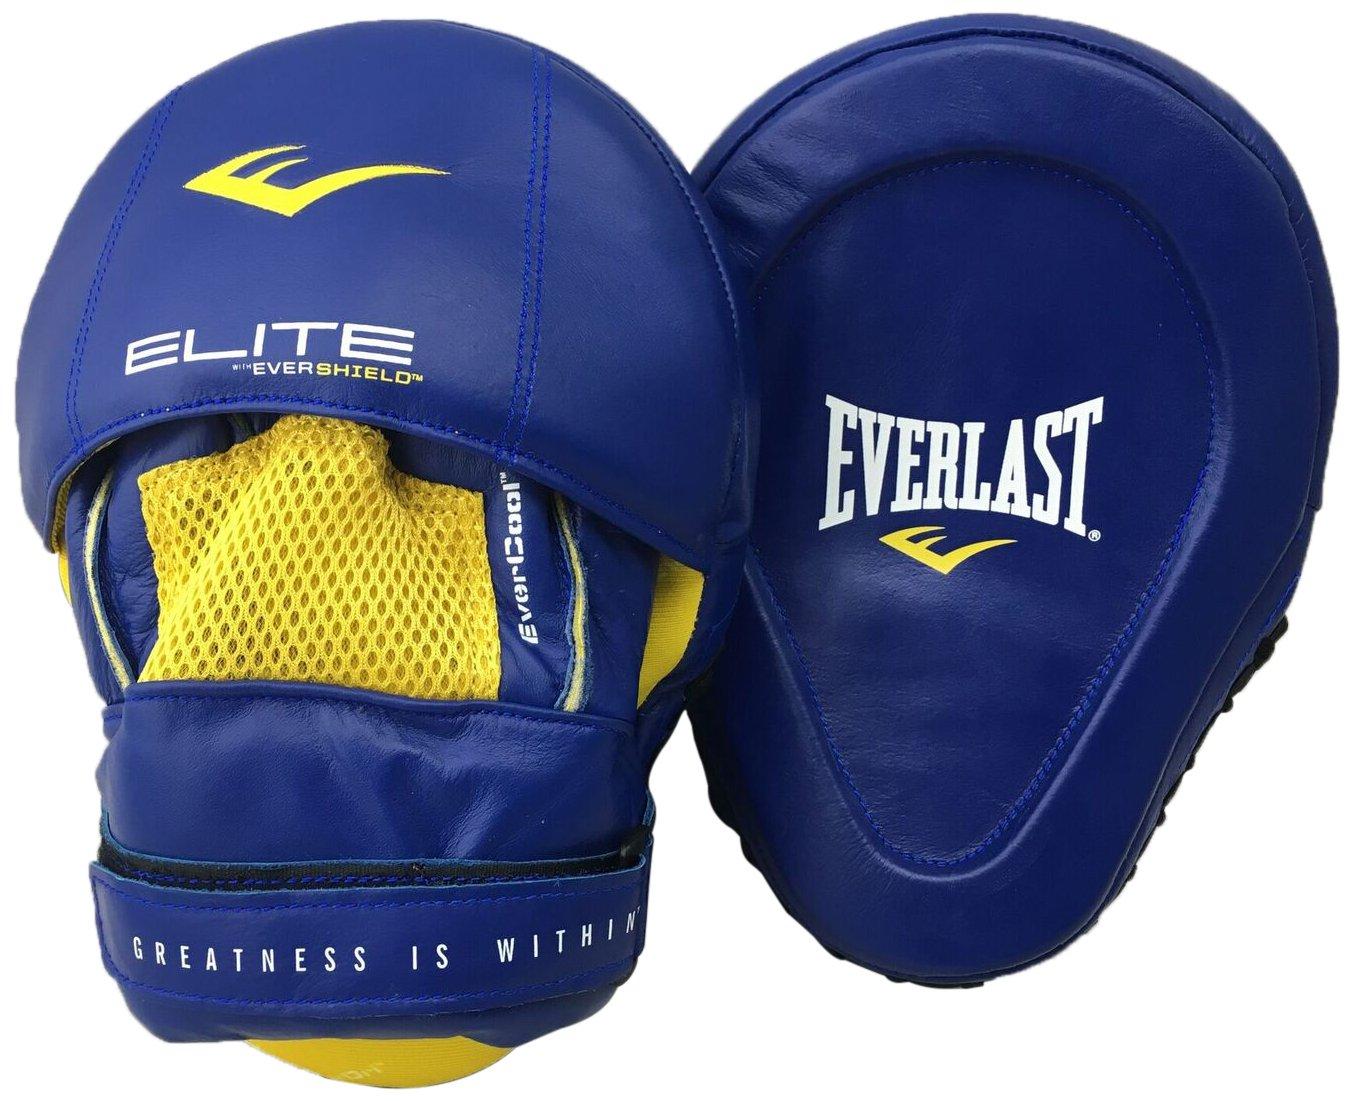 P00000700 One Size Everlast Pro Elite Mantis Mitts Box Item Unisex Blue